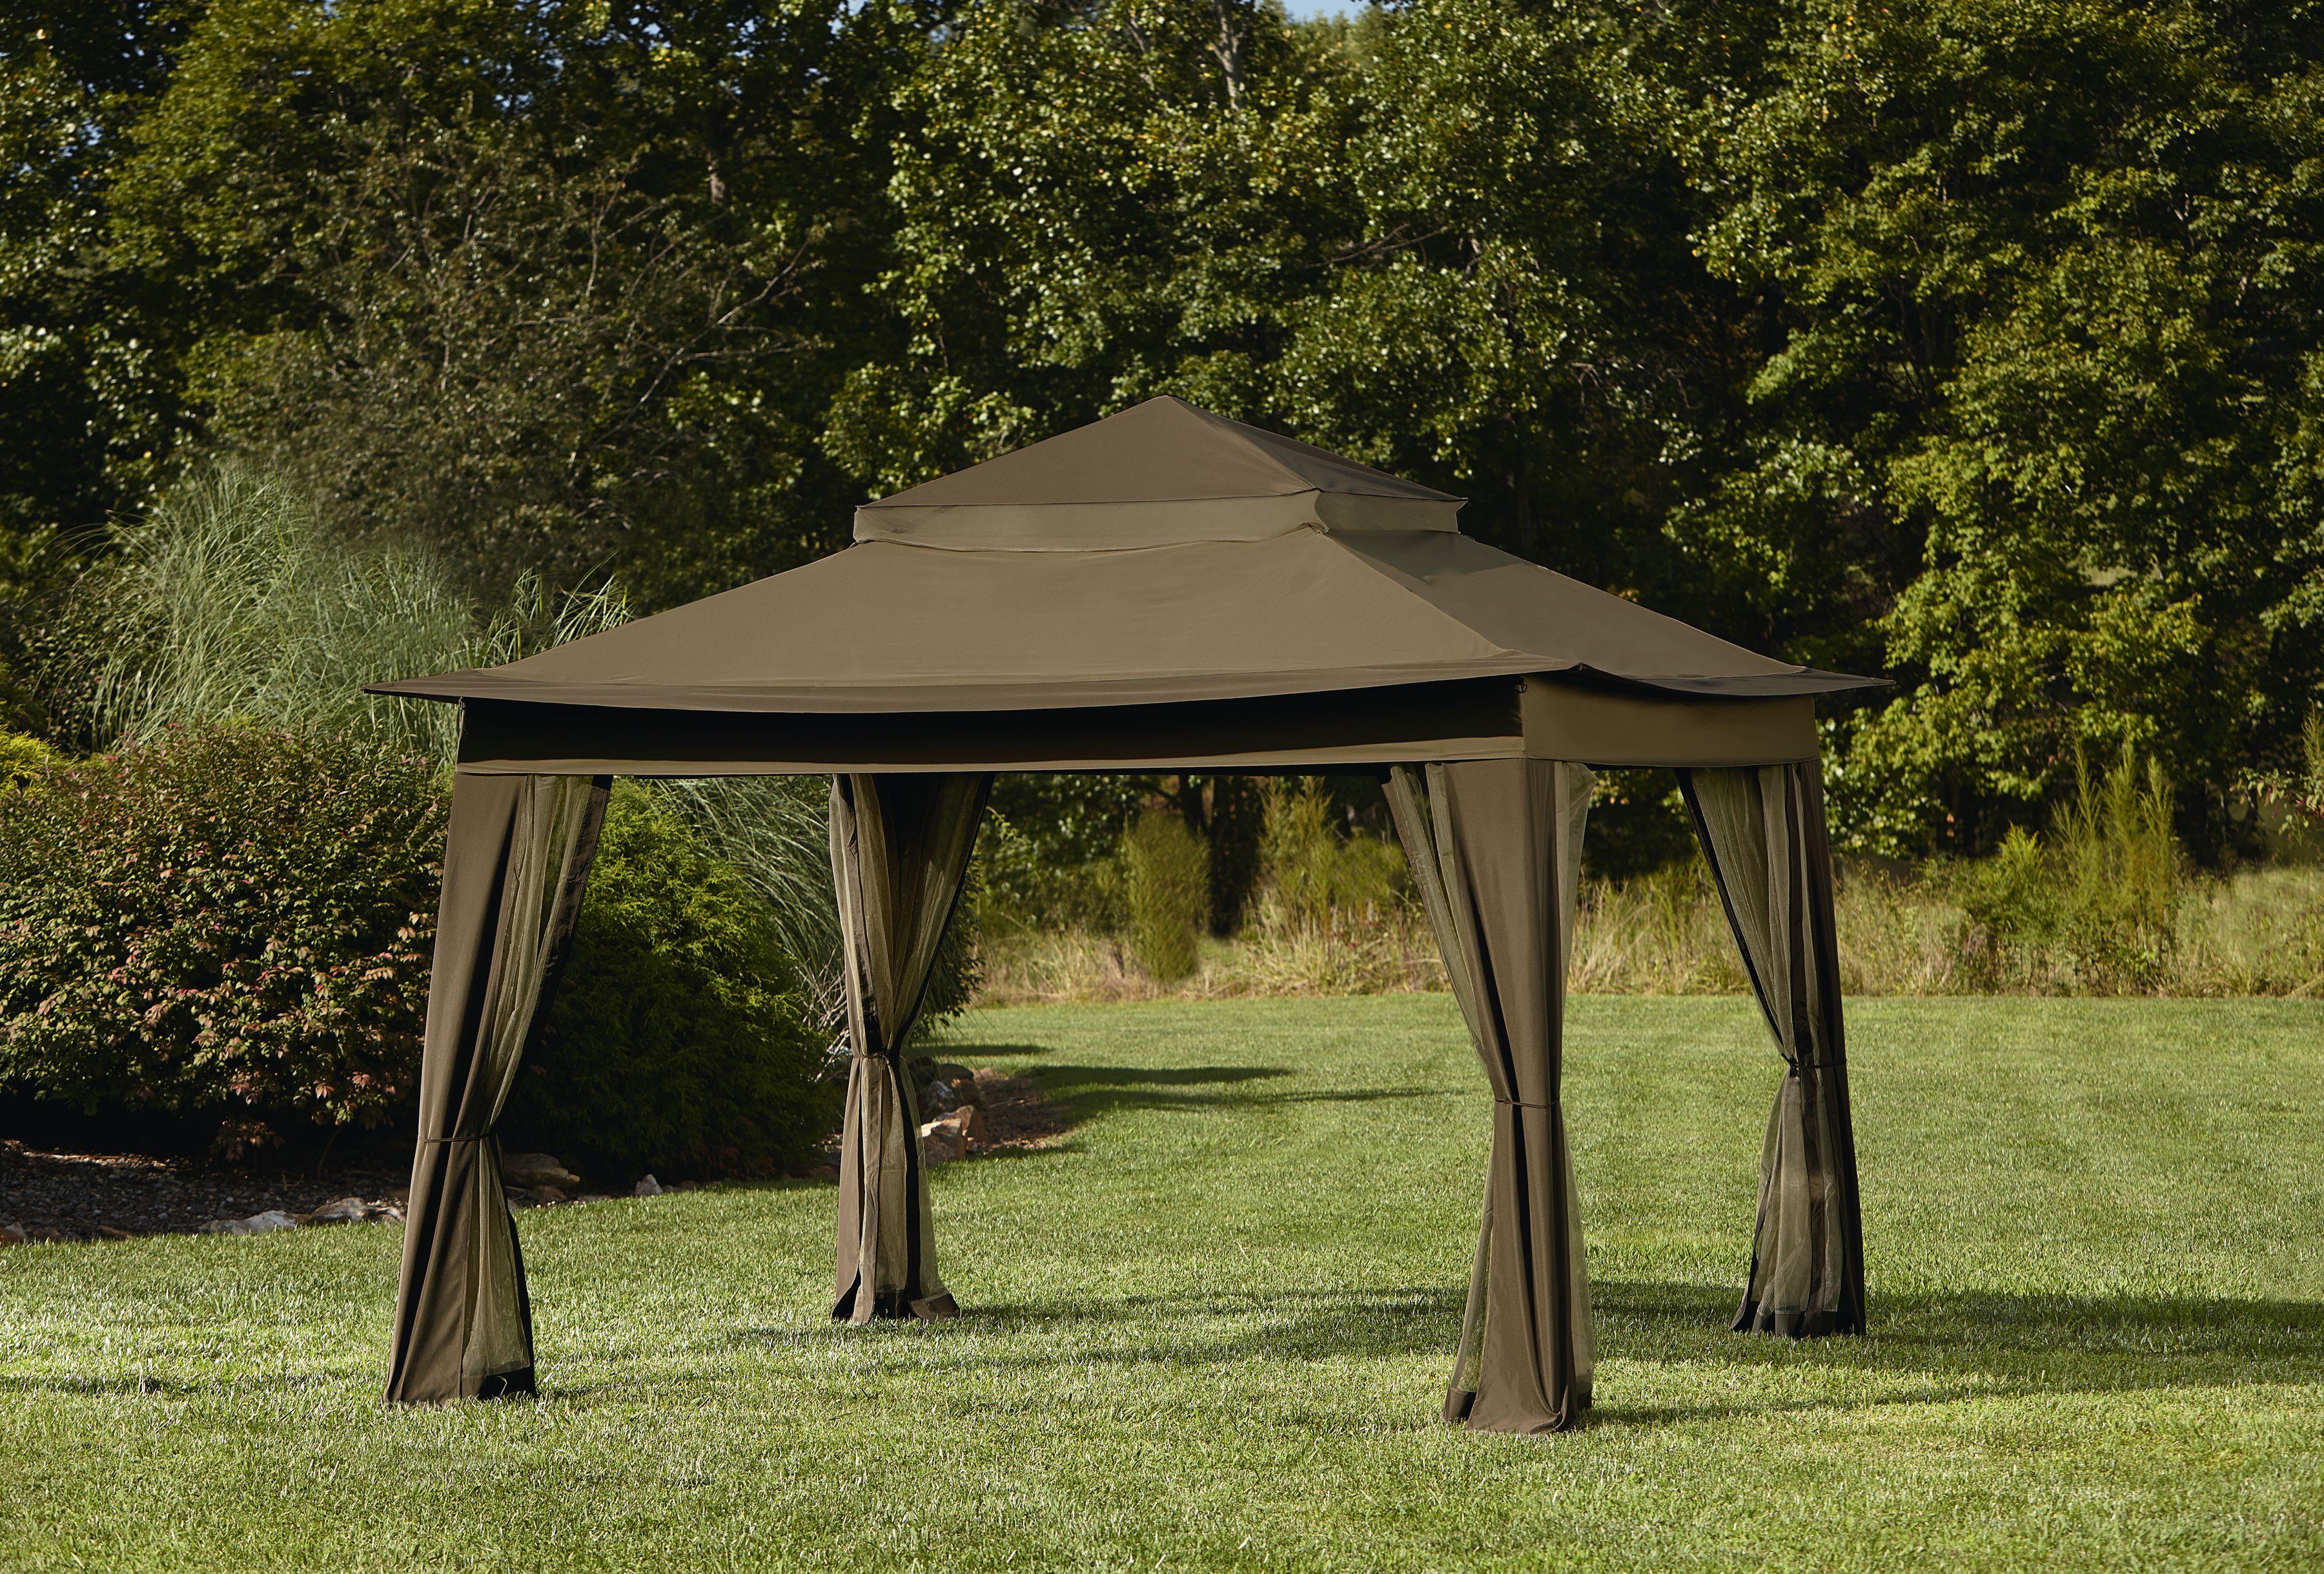 Garden Oasis Pop Up Gazebo Limited Availability Outdoor Living Gazebos Canopies